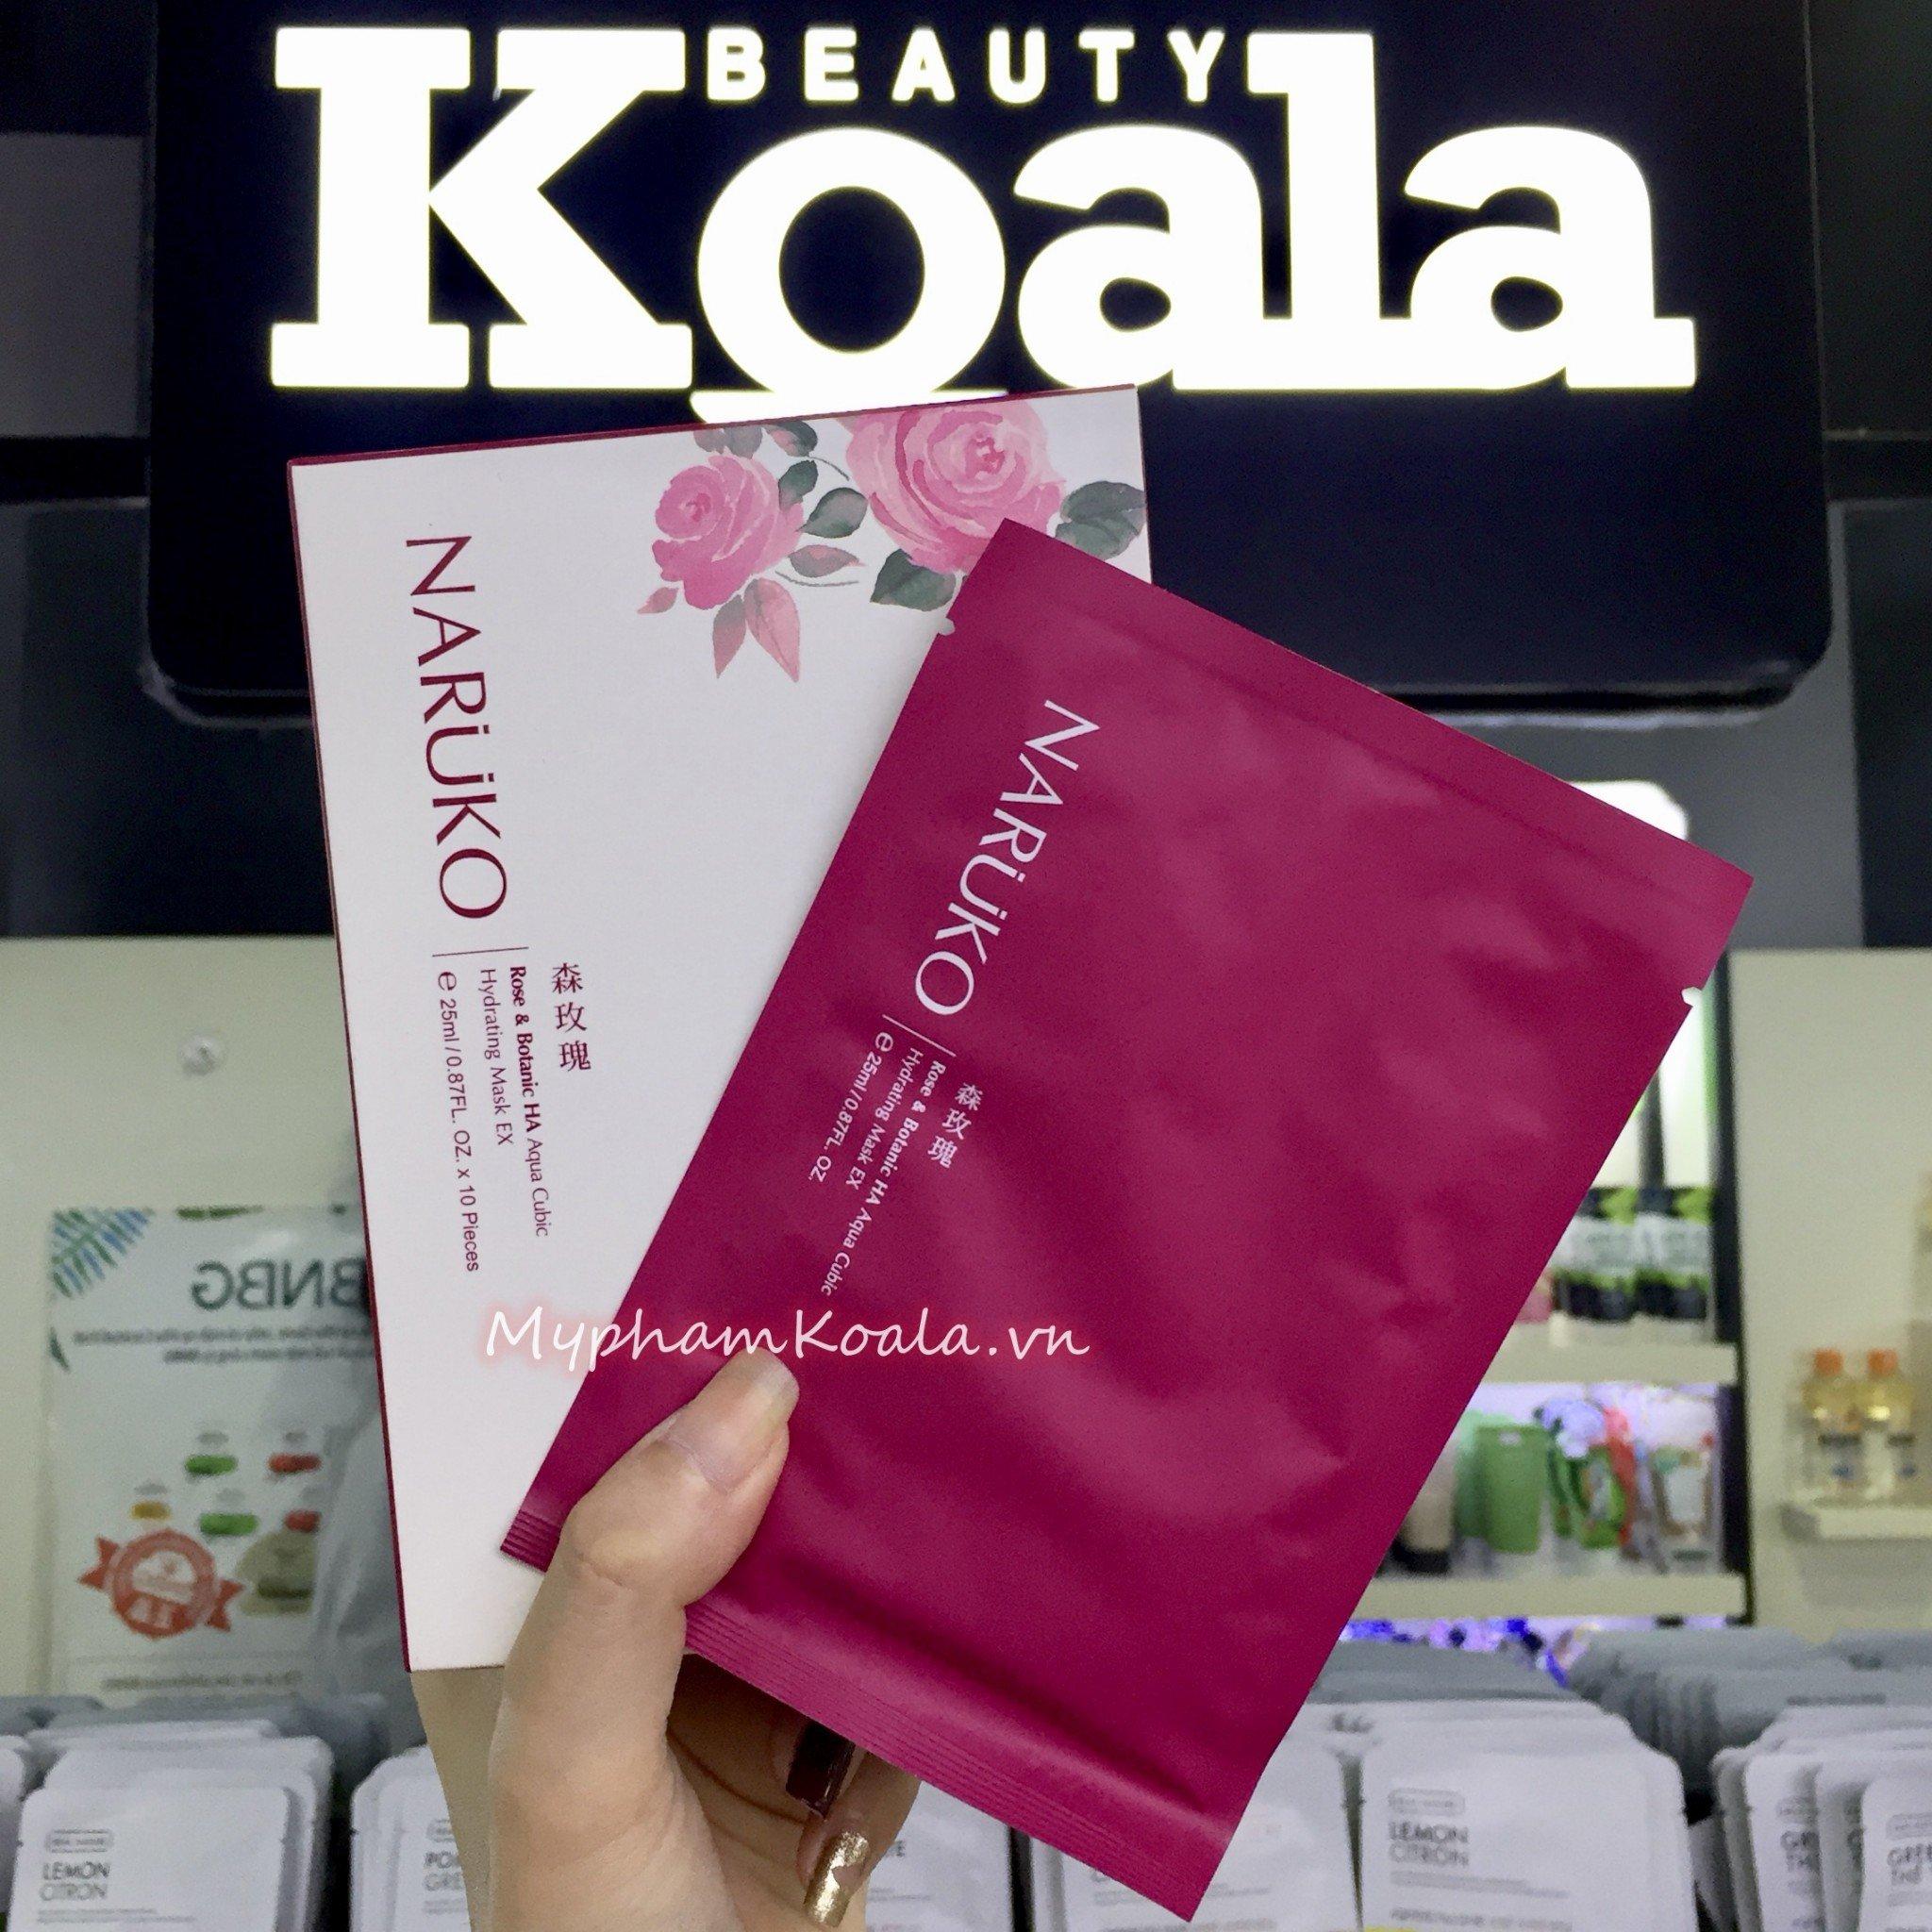 Mặt nạ Cấp Nước Naruko Rose and Botanic HA Aqua Cubic Hydrating Mask EX